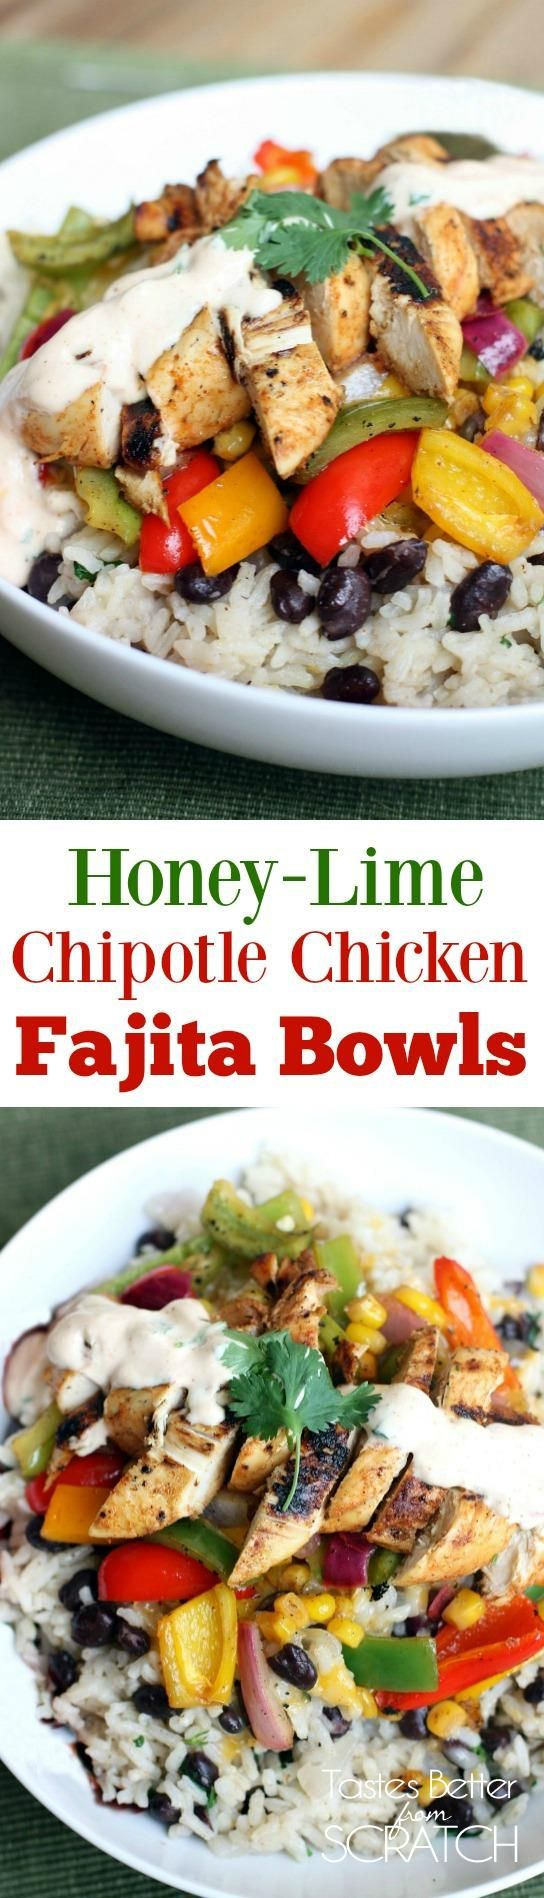 Honey-Lime Chipotle Chicken Fajita Bowls